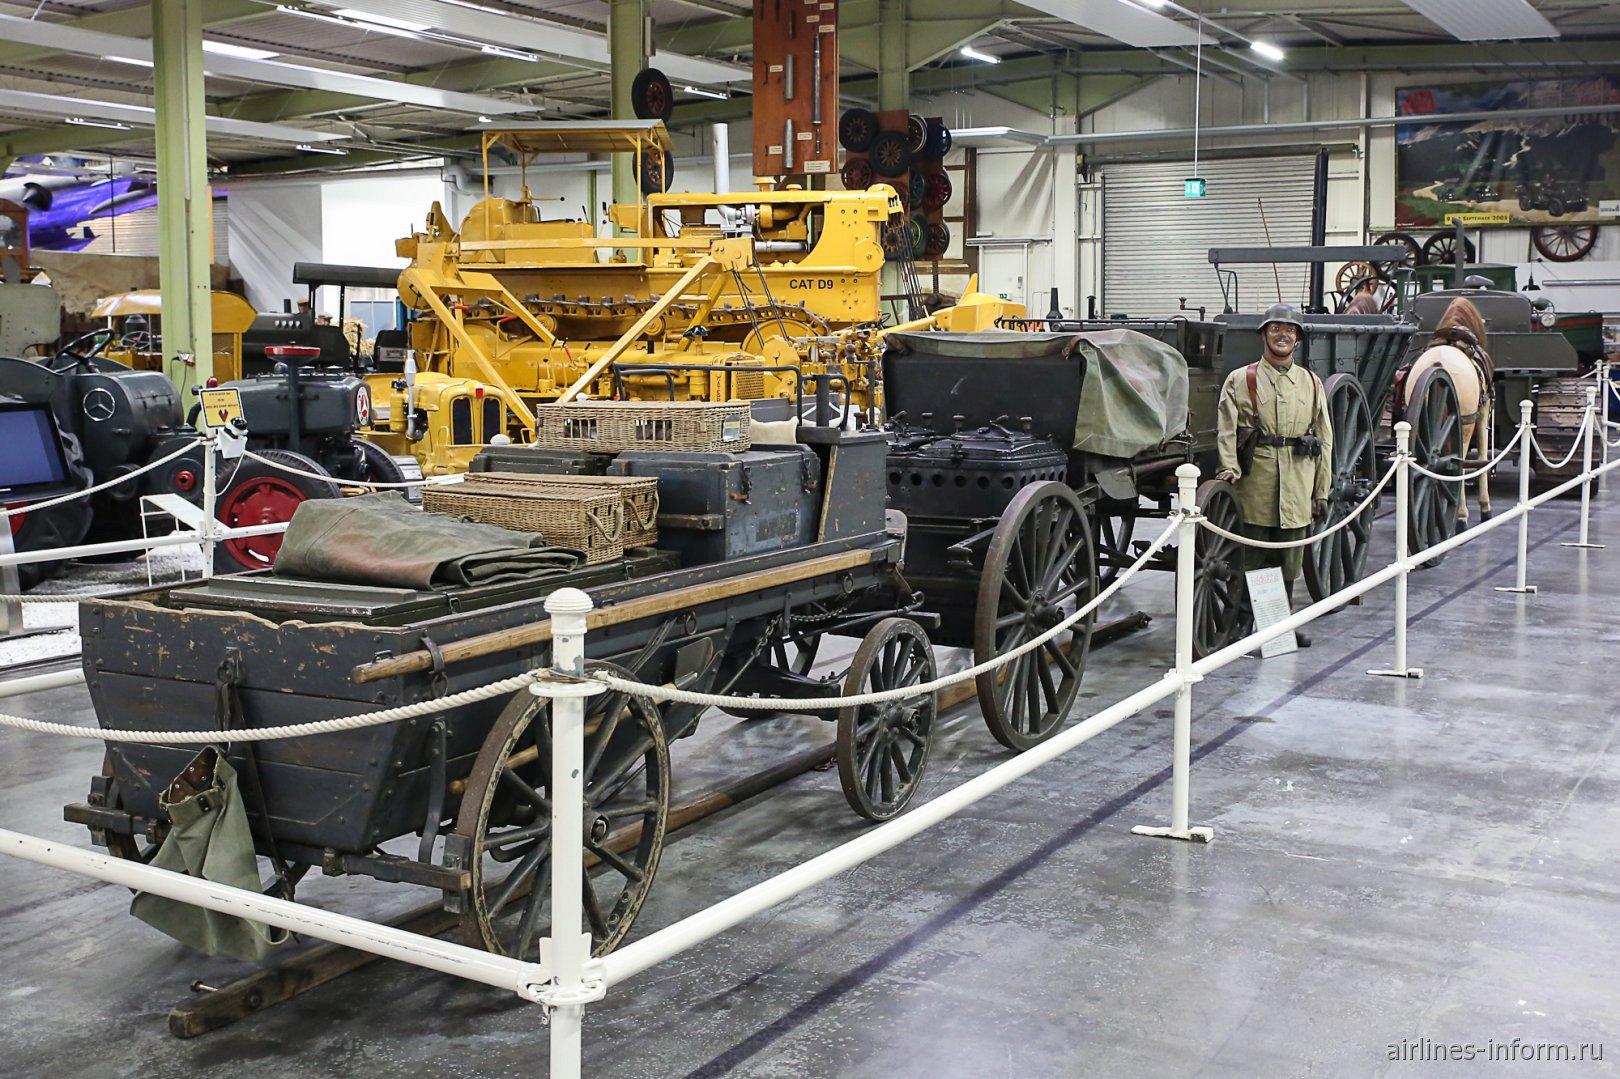 Немецкий армейский обоз в музее техники в Зинсхайме